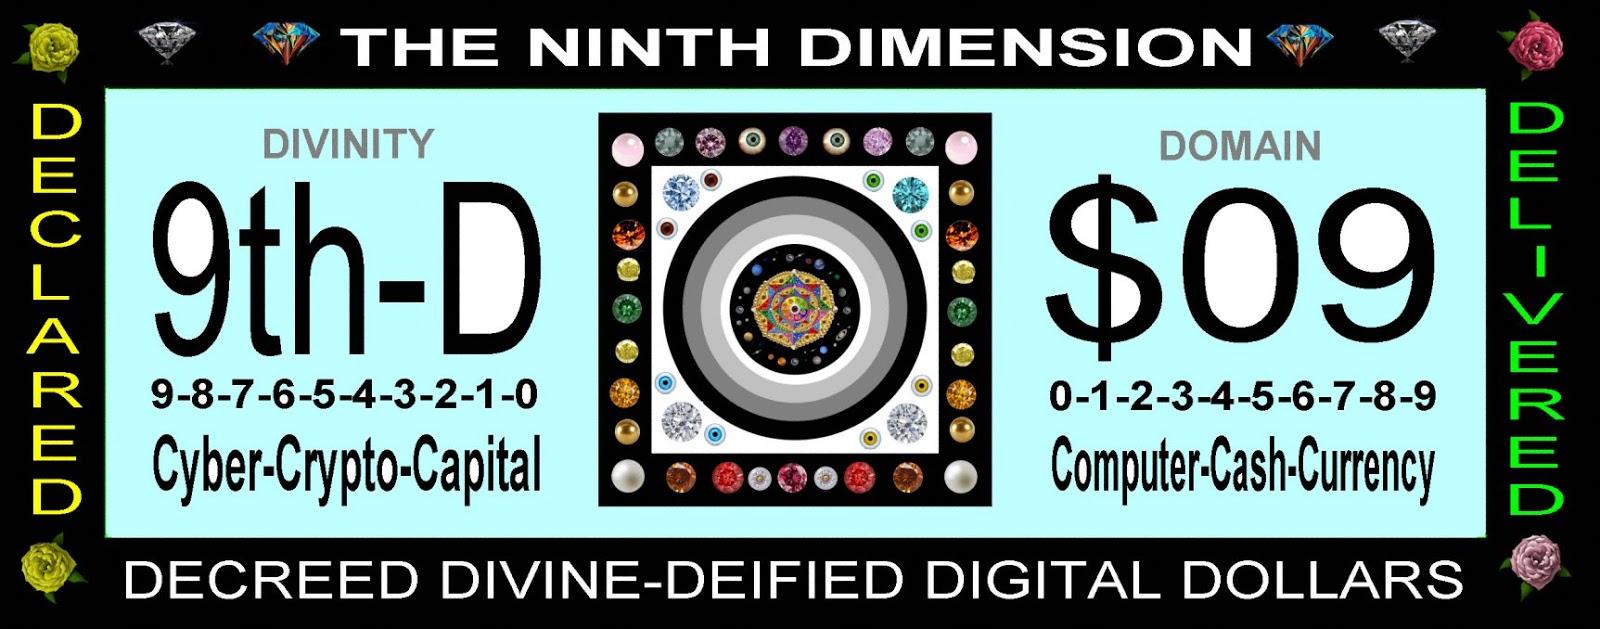 Color Kingdom New World Creative Arts Alternating Current Of A Plasma Display Diagram Poster Zazzle Digital Dollar Deified 09 Http Storepayloadzcom Go Id2526482